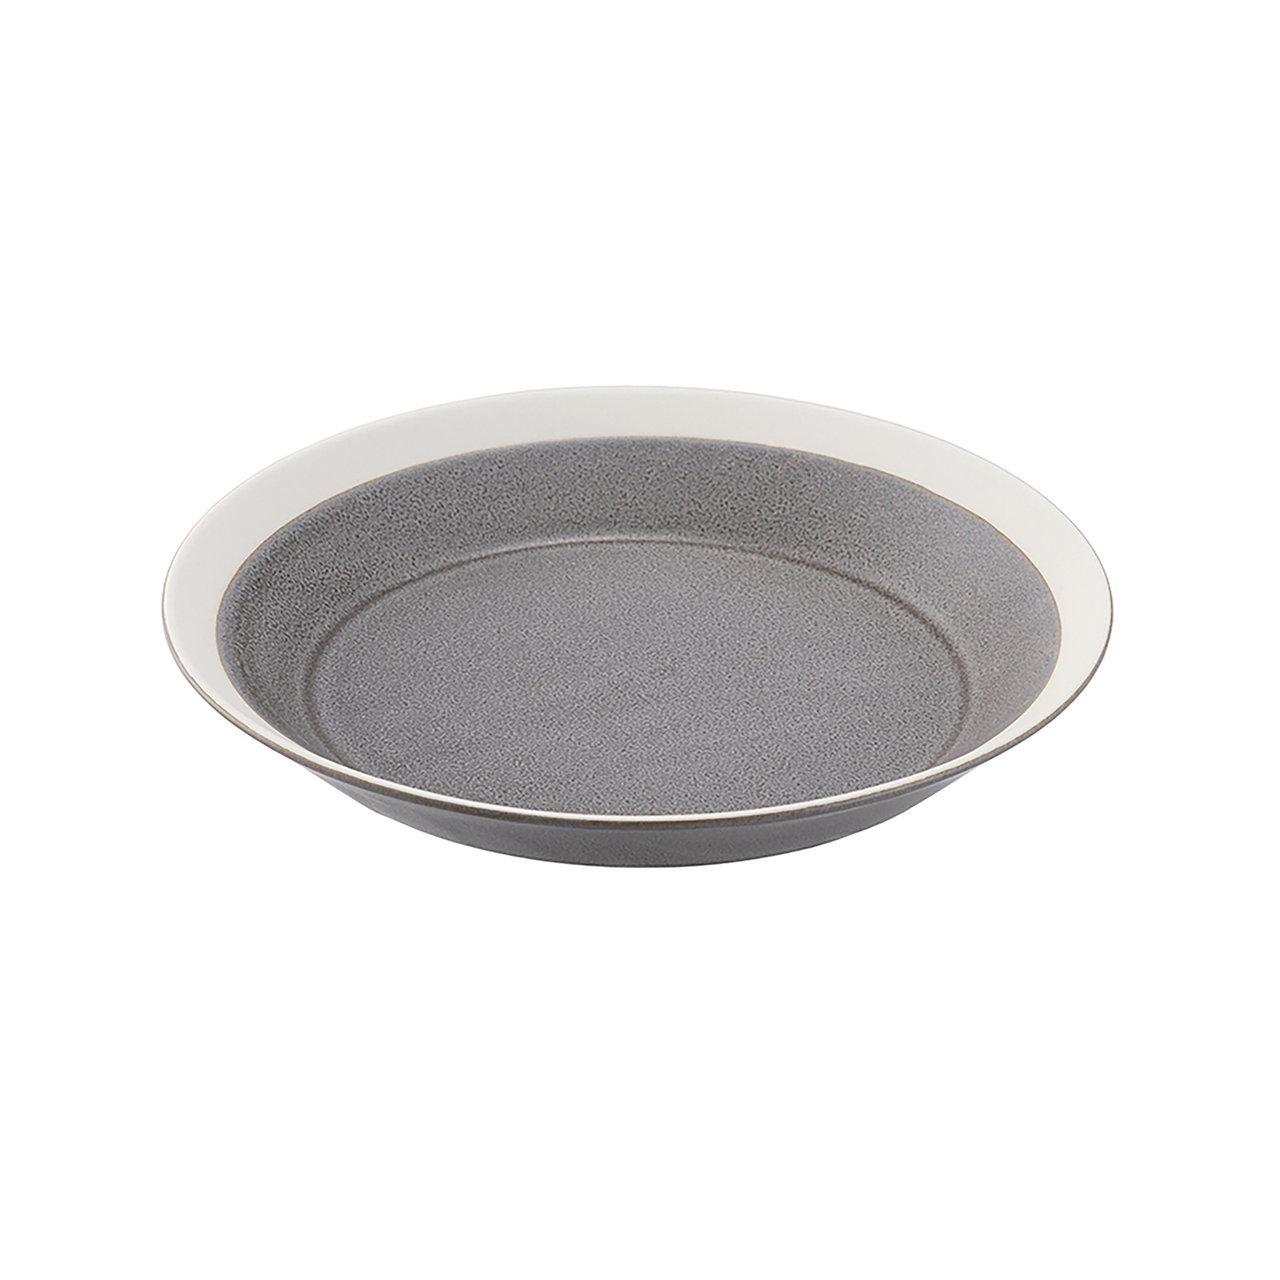 yumiko iihoshi porcelain(ユミコイイホシポーセリン)×木村硝子店 dishes 180 plate (moss gray) /matte  プレート 皿 18cm 日本製 255275